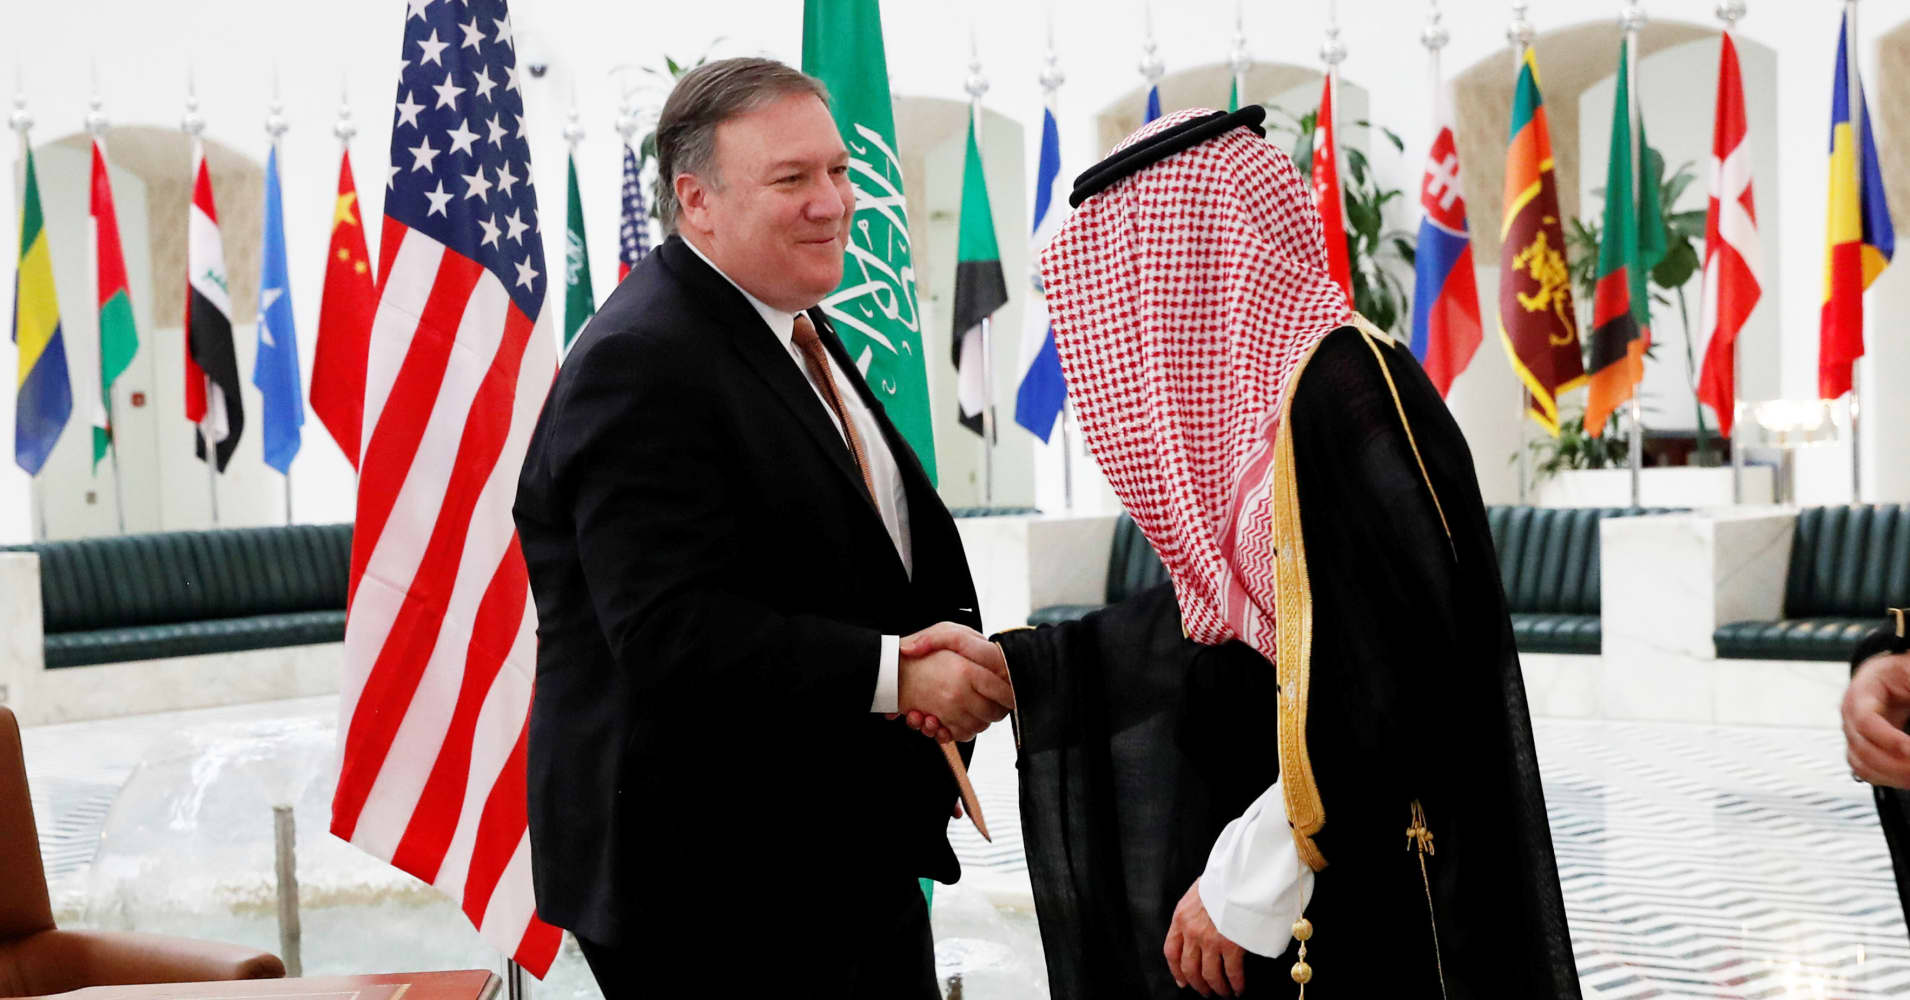 Top US diplomat in Saudi Arabia for talks over Khashoggi